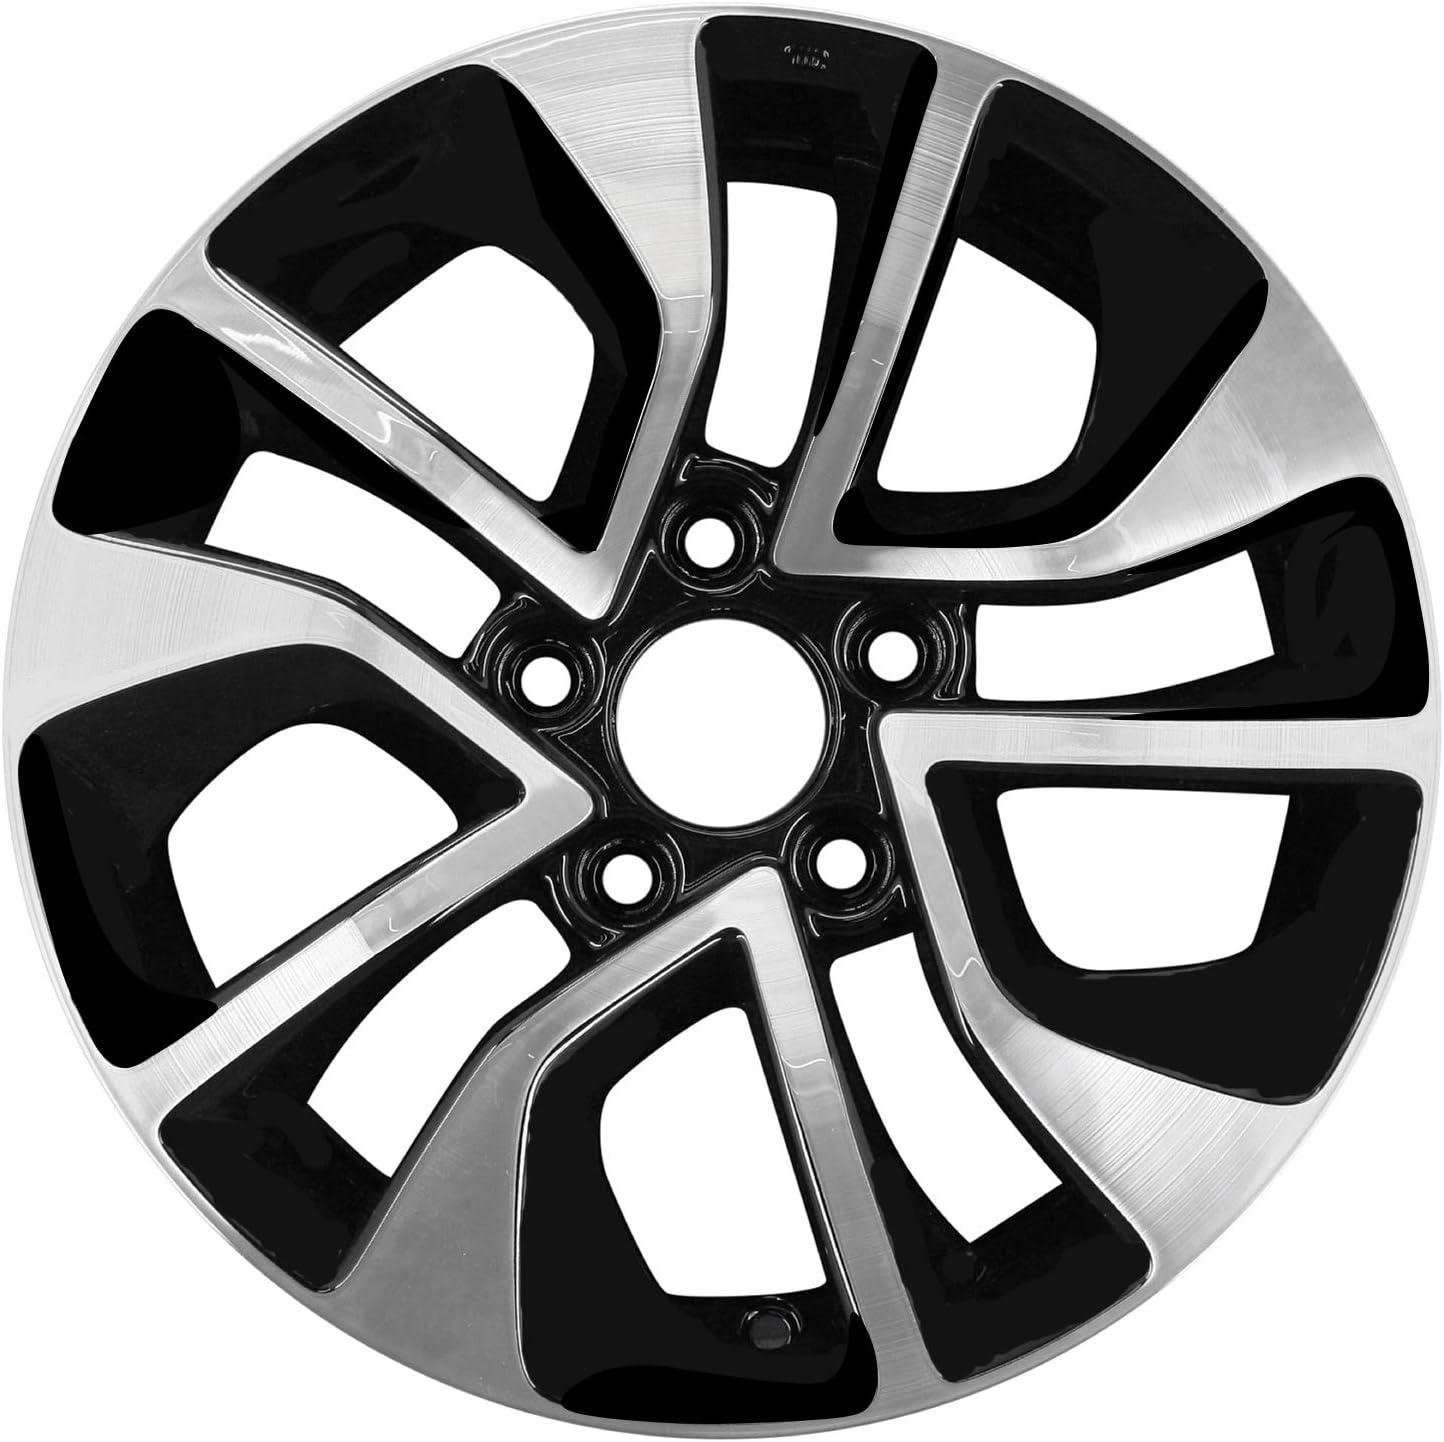 Amazon Com Auto Rim Shop Brand New 16 Replacement Wheel For Honda Civic 2013 2014 2015 Automotive